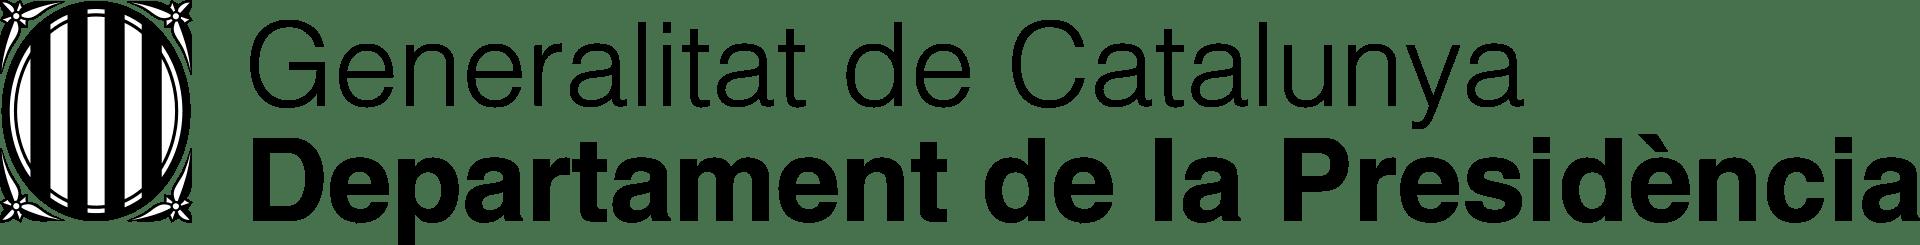 Generalitat de Catalunya. Departame